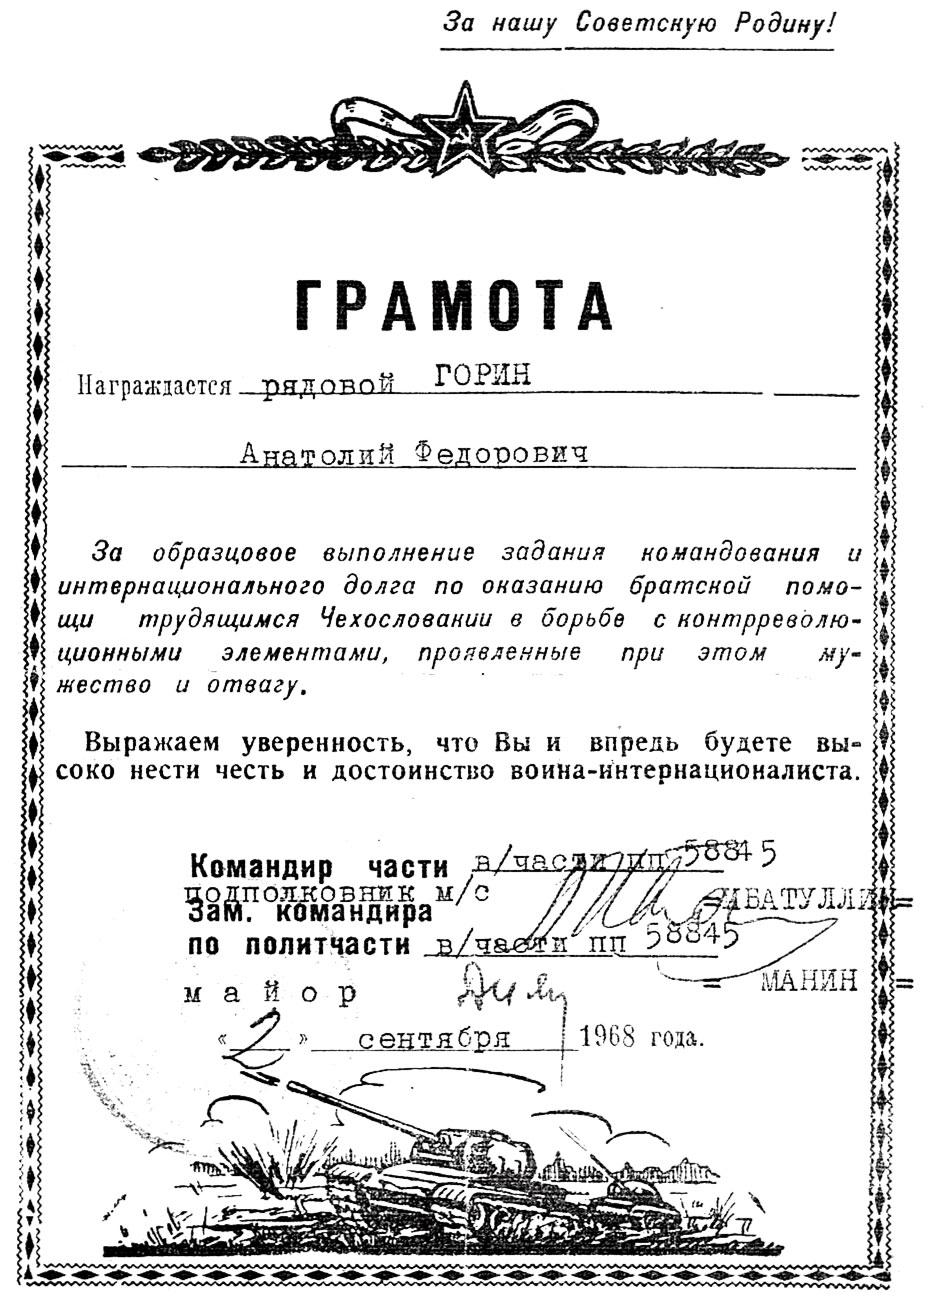 Грамота Горину А.Ф.